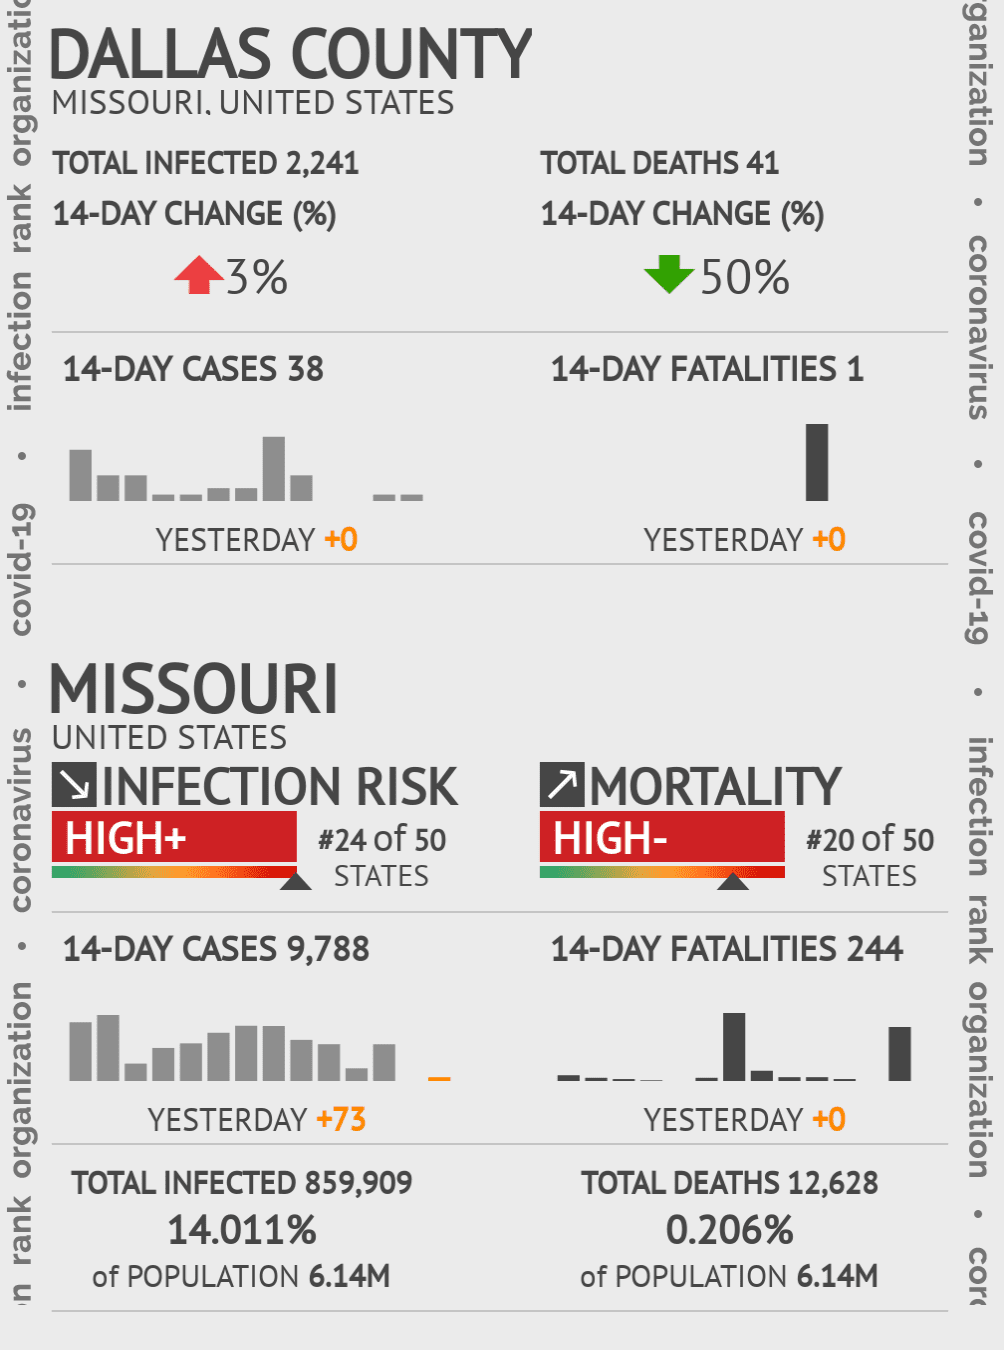 Dallas County Coronavirus Covid-19 Risk of Infection on July 24, 2021